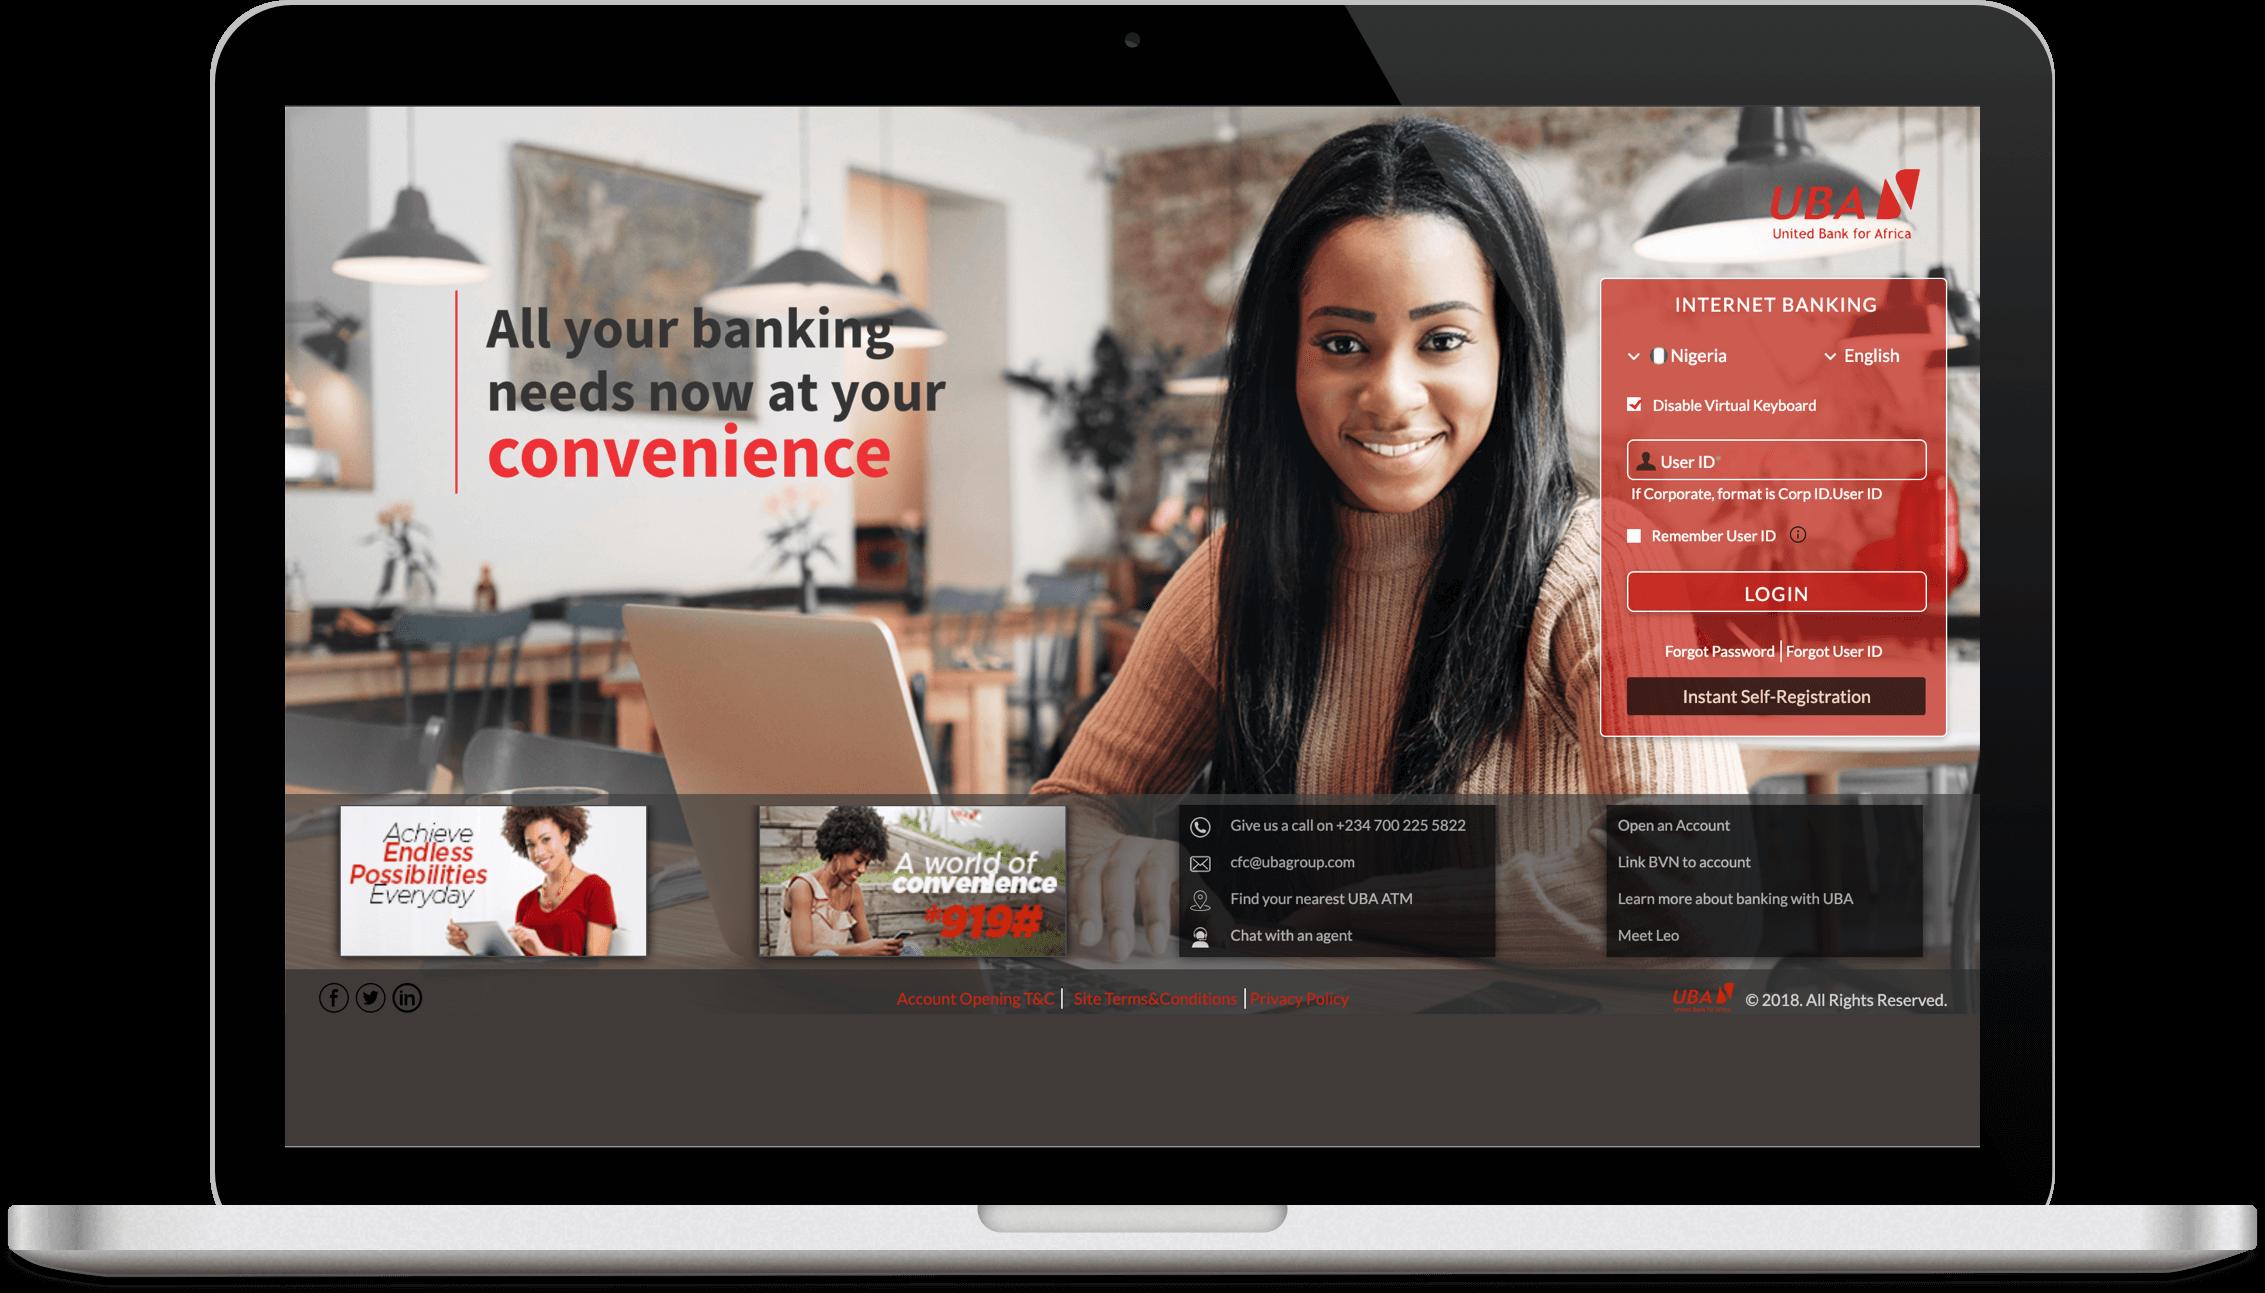 UBA-Corporate-personal-Internet-banking